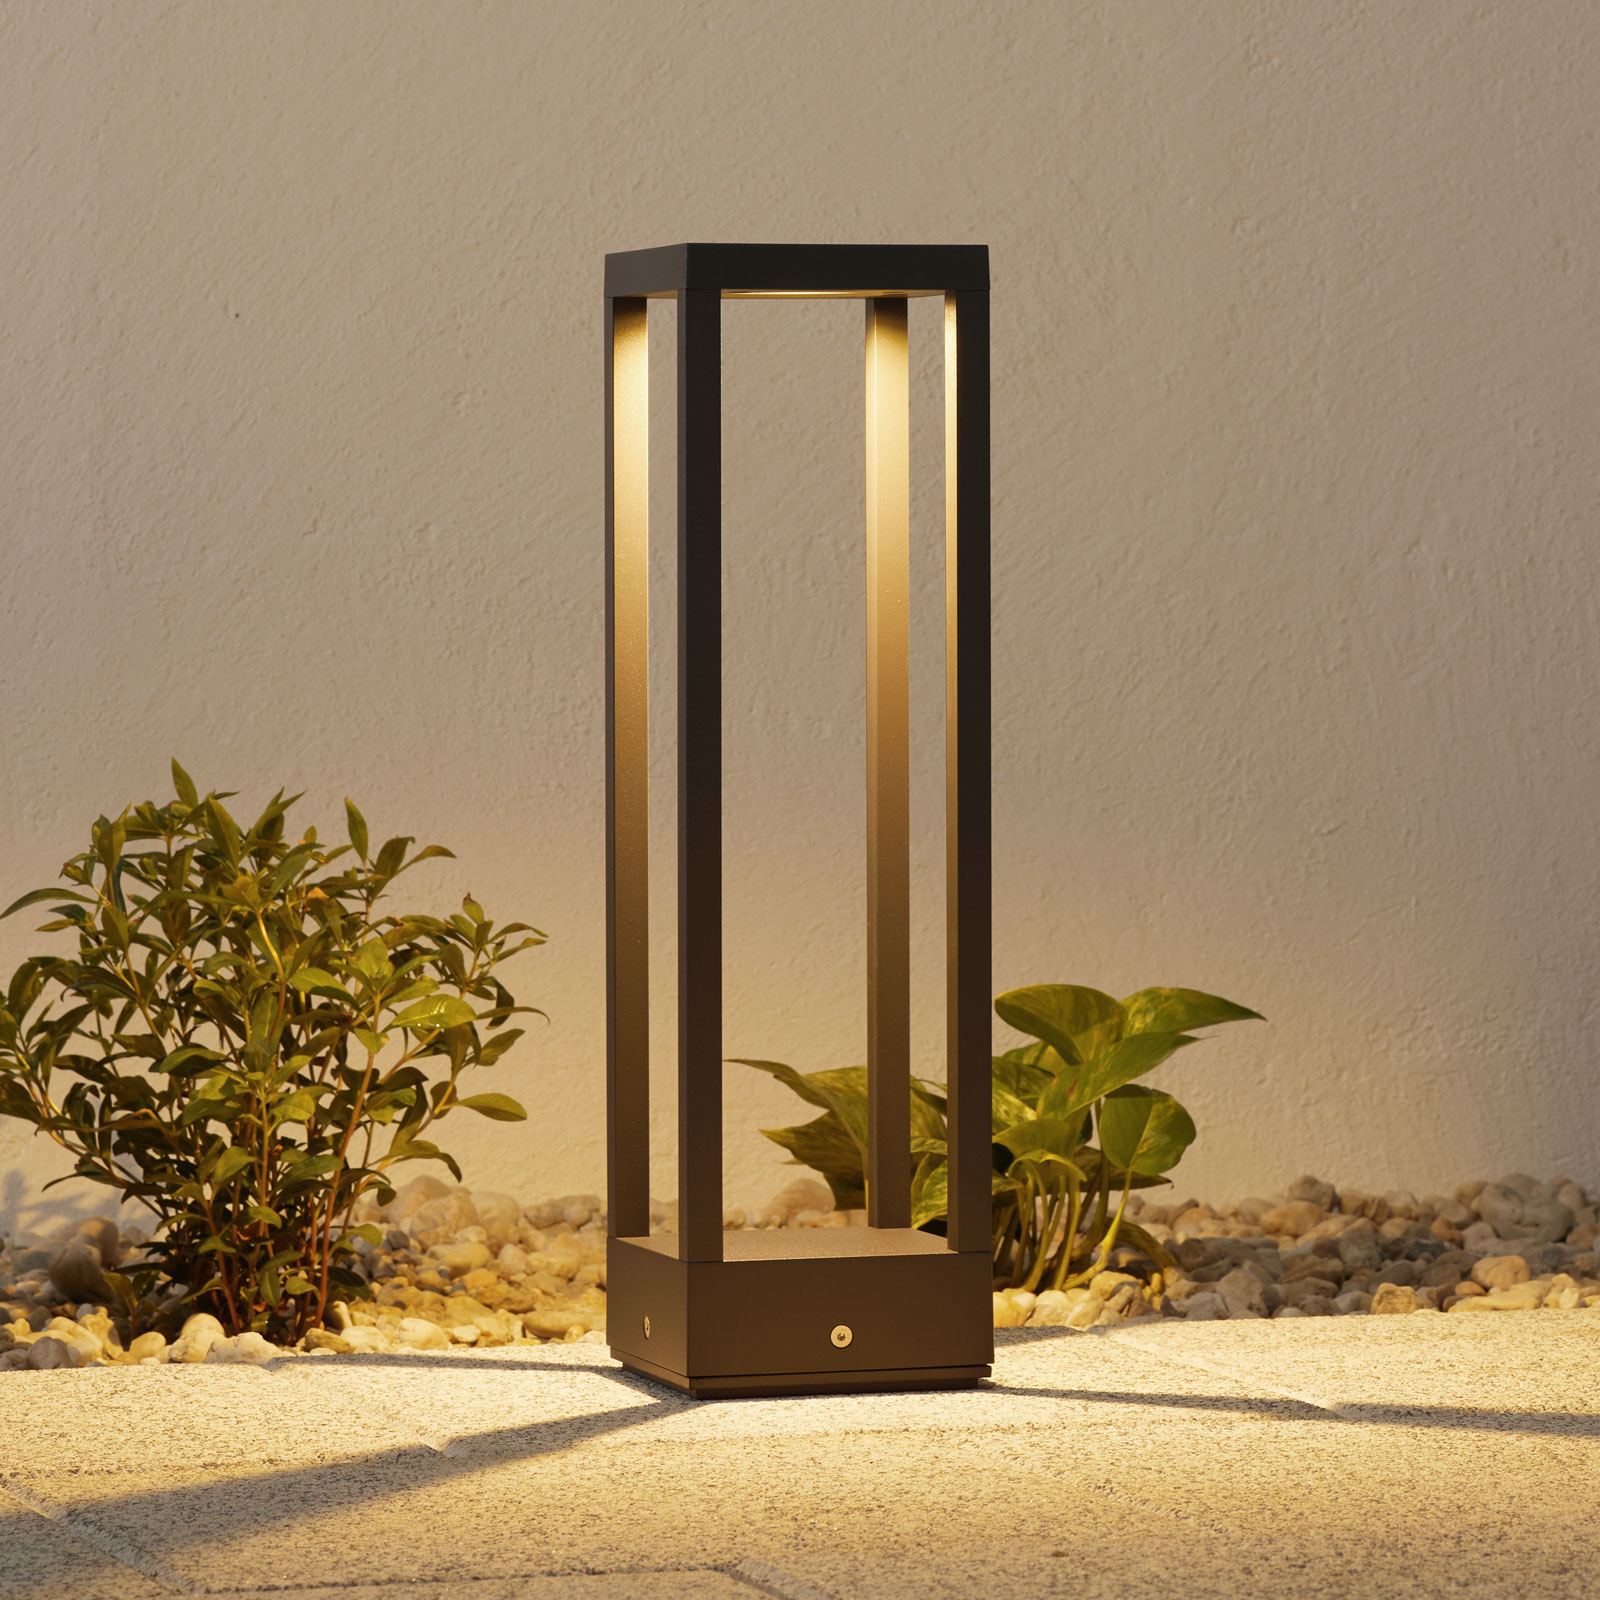 LED-pollarivalaisin Carlota, tummanharmaa, 50 cm